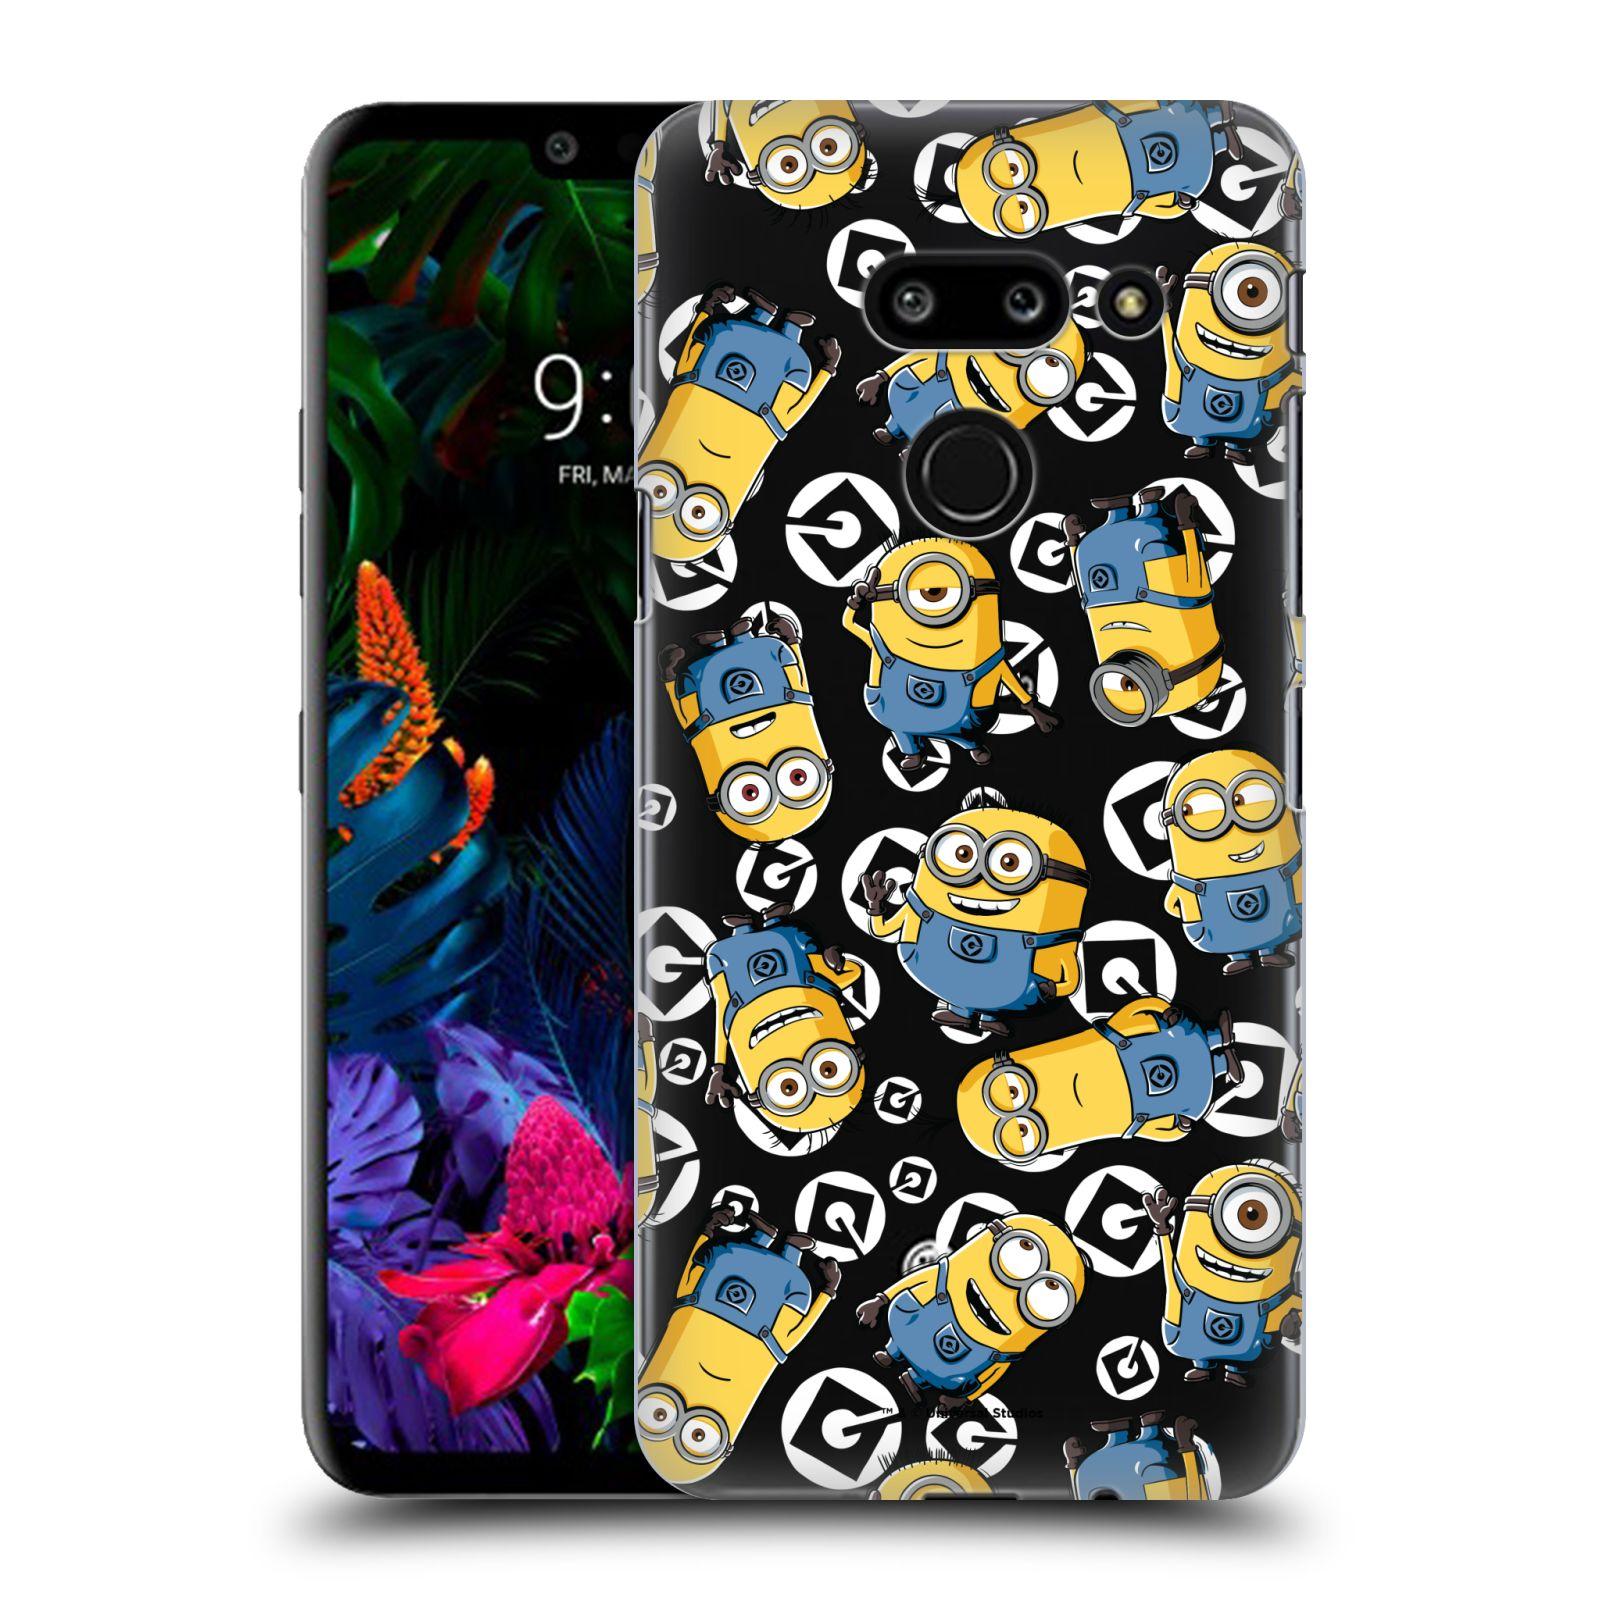 Plastové pouzdro na mobil LG G8 ThinQ - Head Case - Minion pattern z filmu Já, padouch - Despicable Me